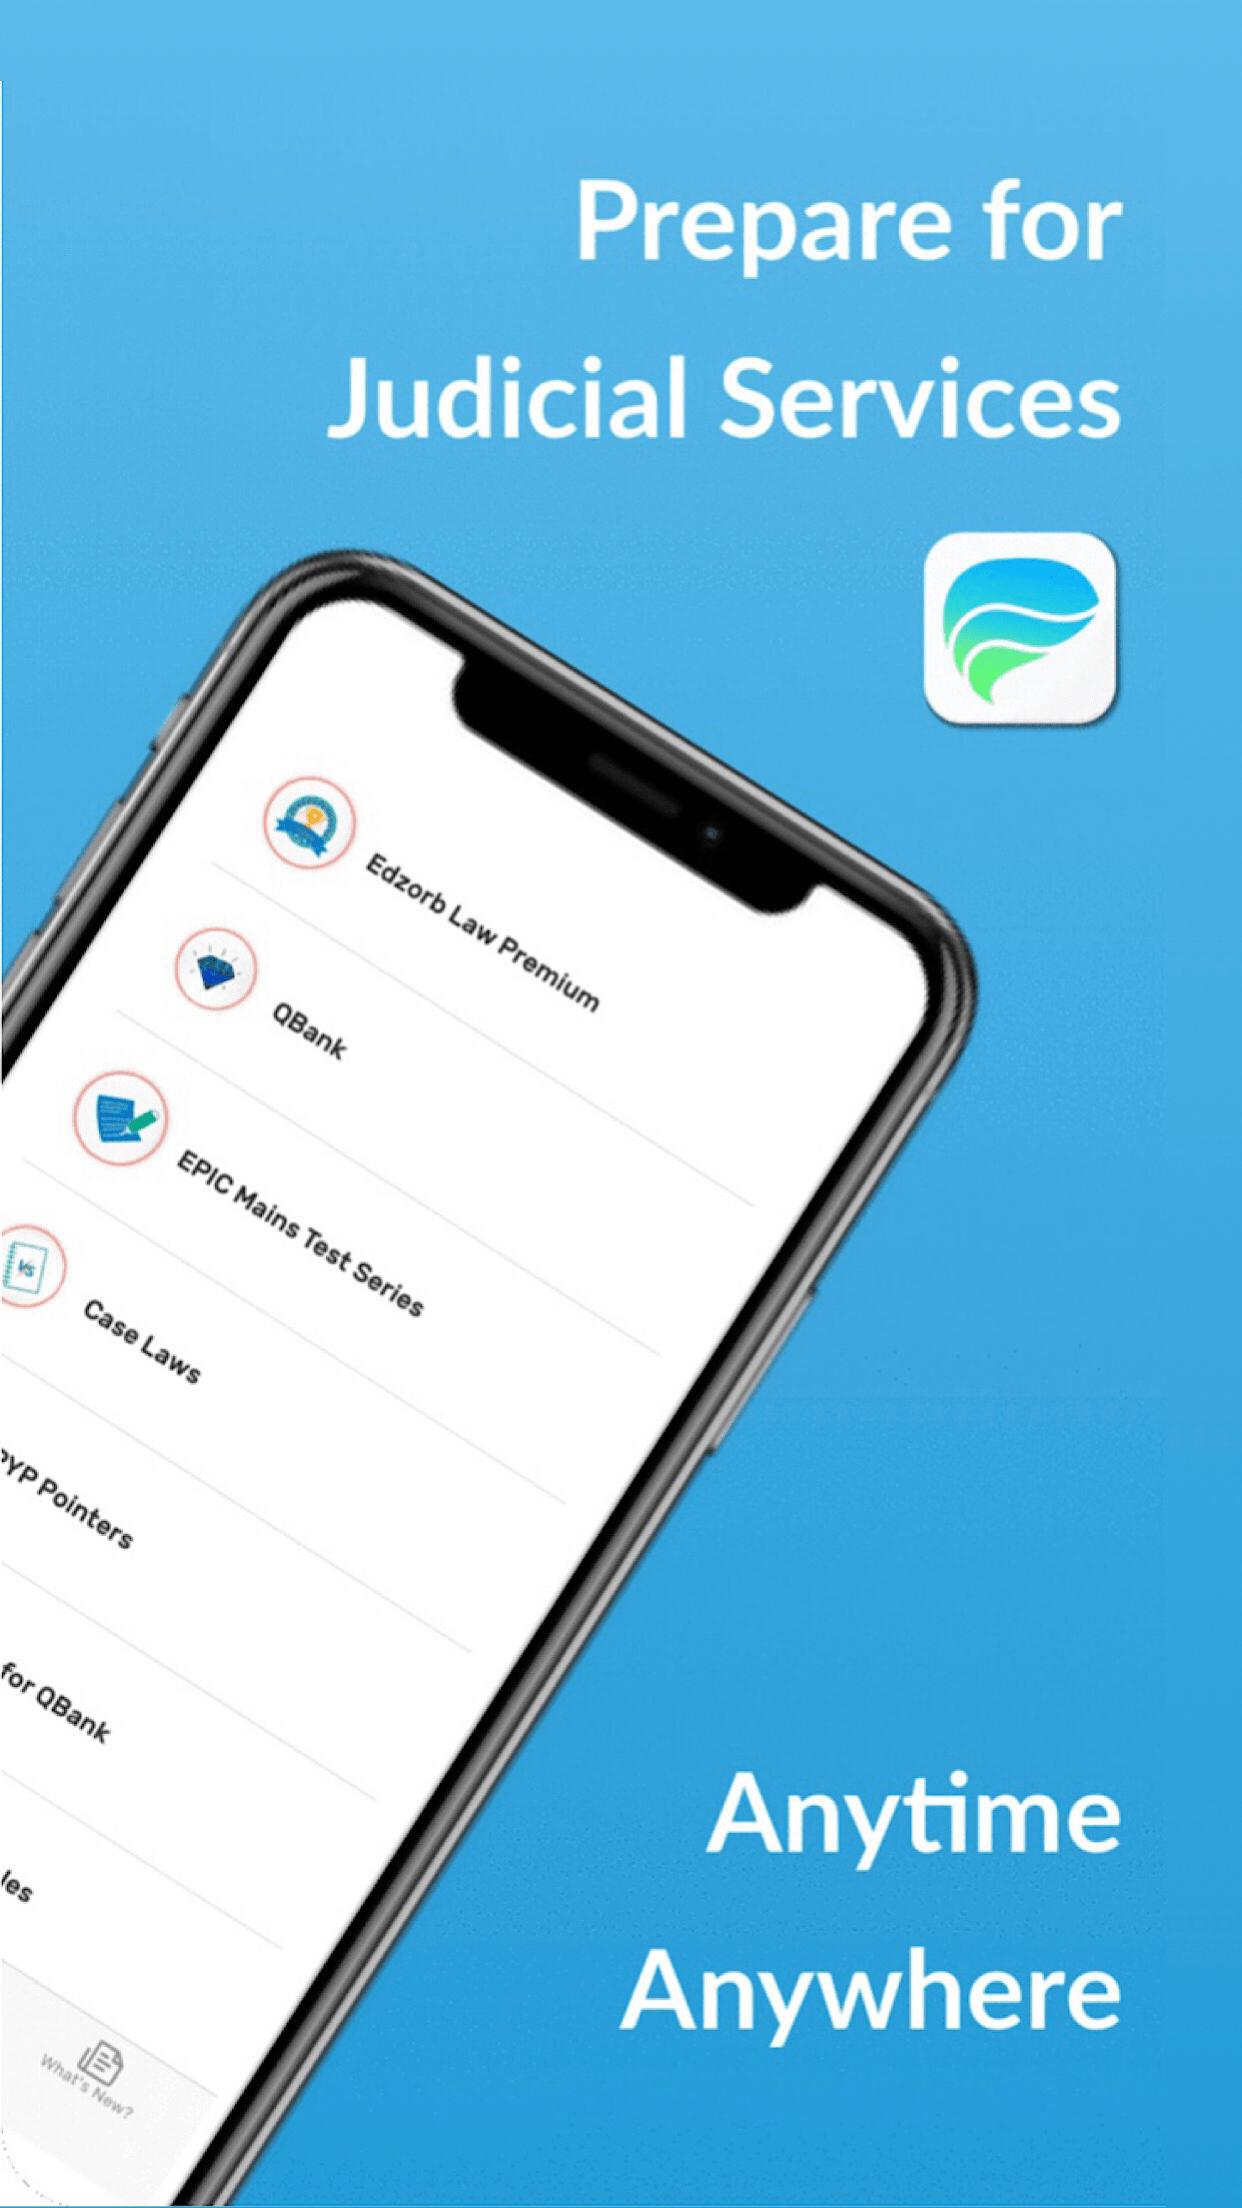 Edzorb Law App Screen shot - Prepare anywhere any time-min